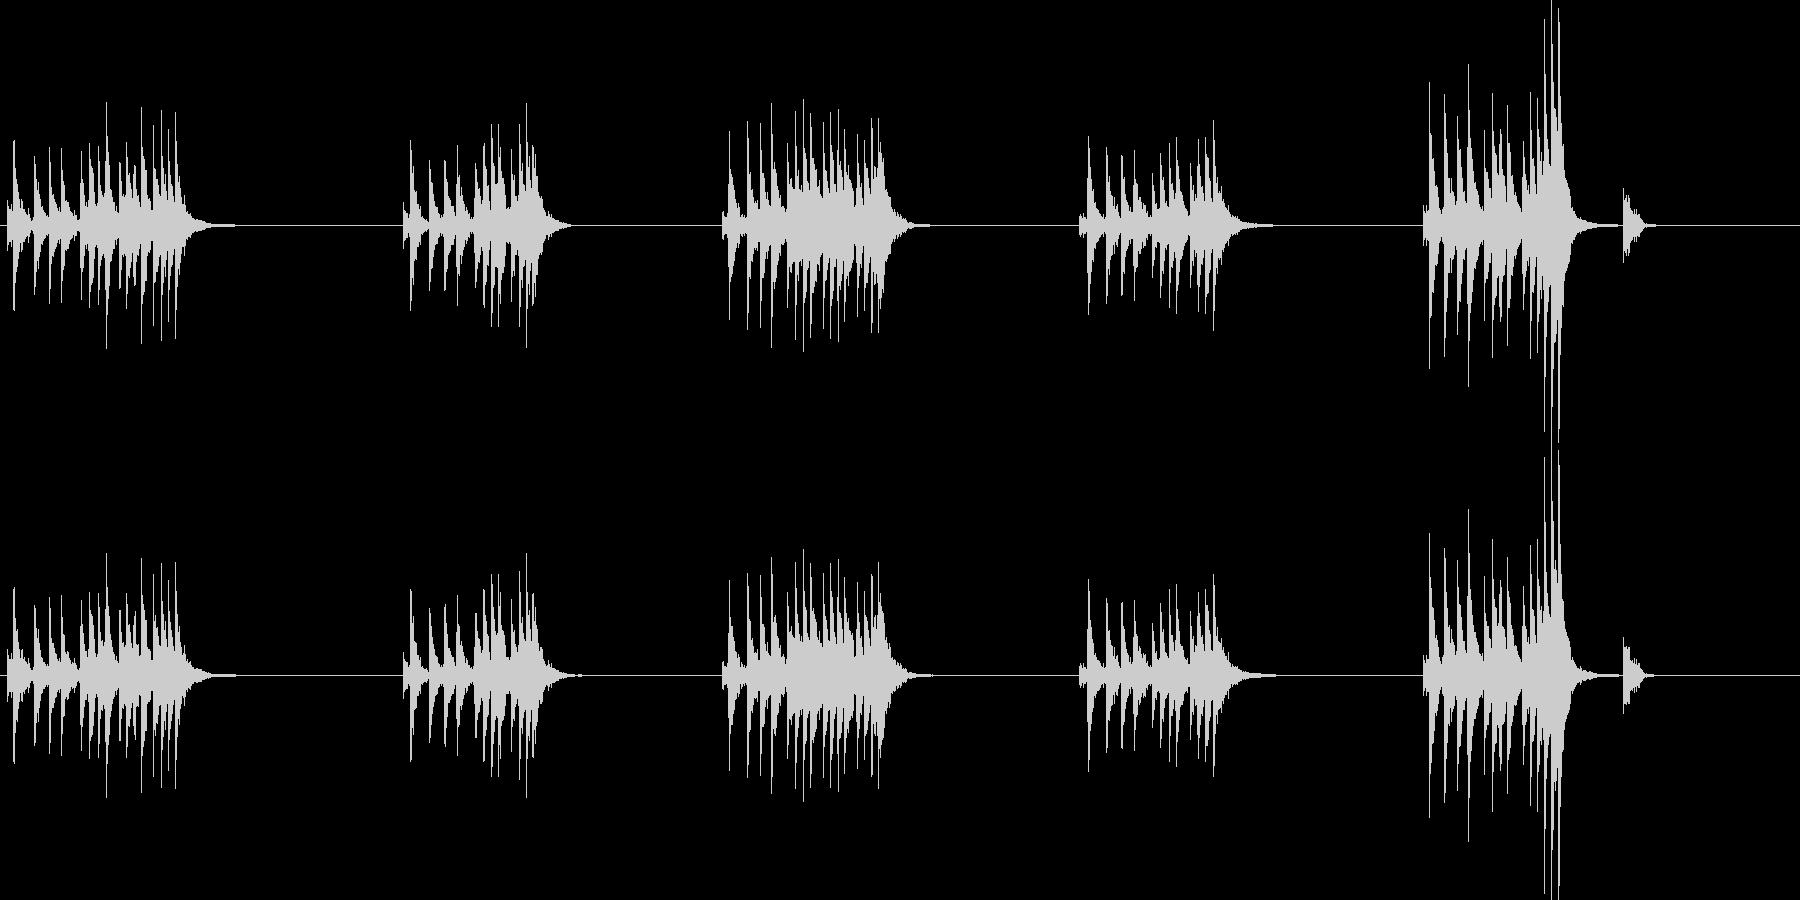 大太鼓8風音歌舞伎情景描写和風和太鼓ホラの未再生の波形